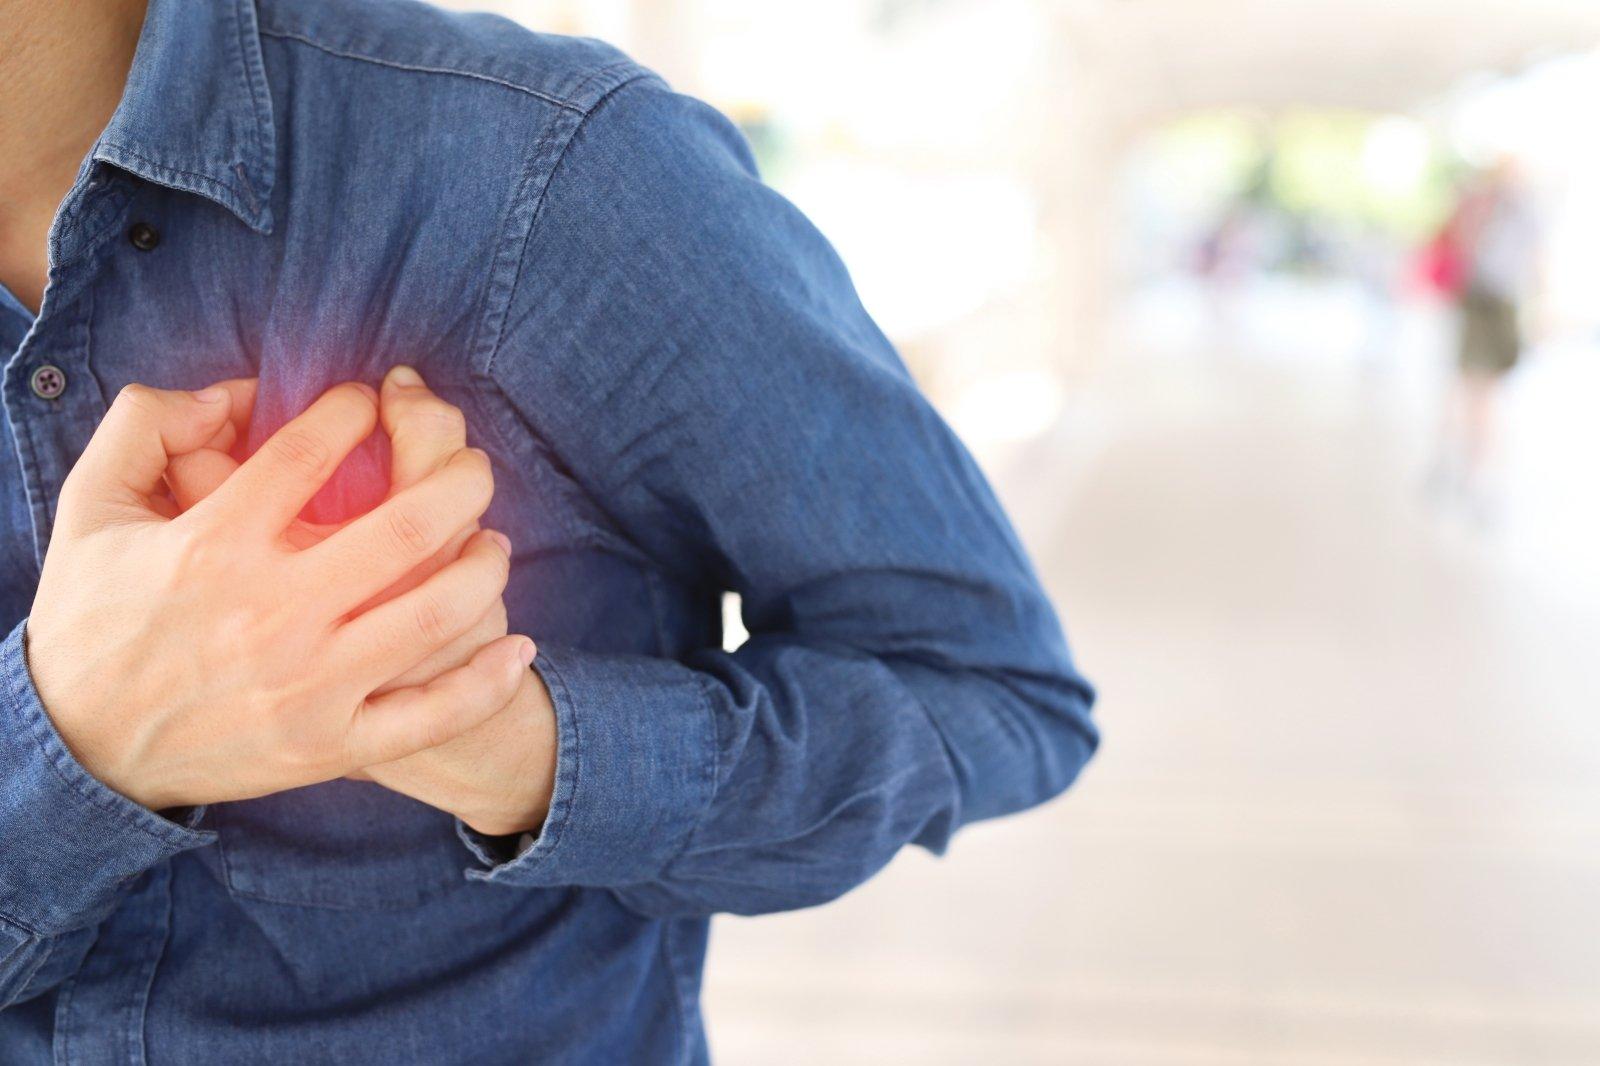 širdies širdies sveikatos dr rekomenduojama